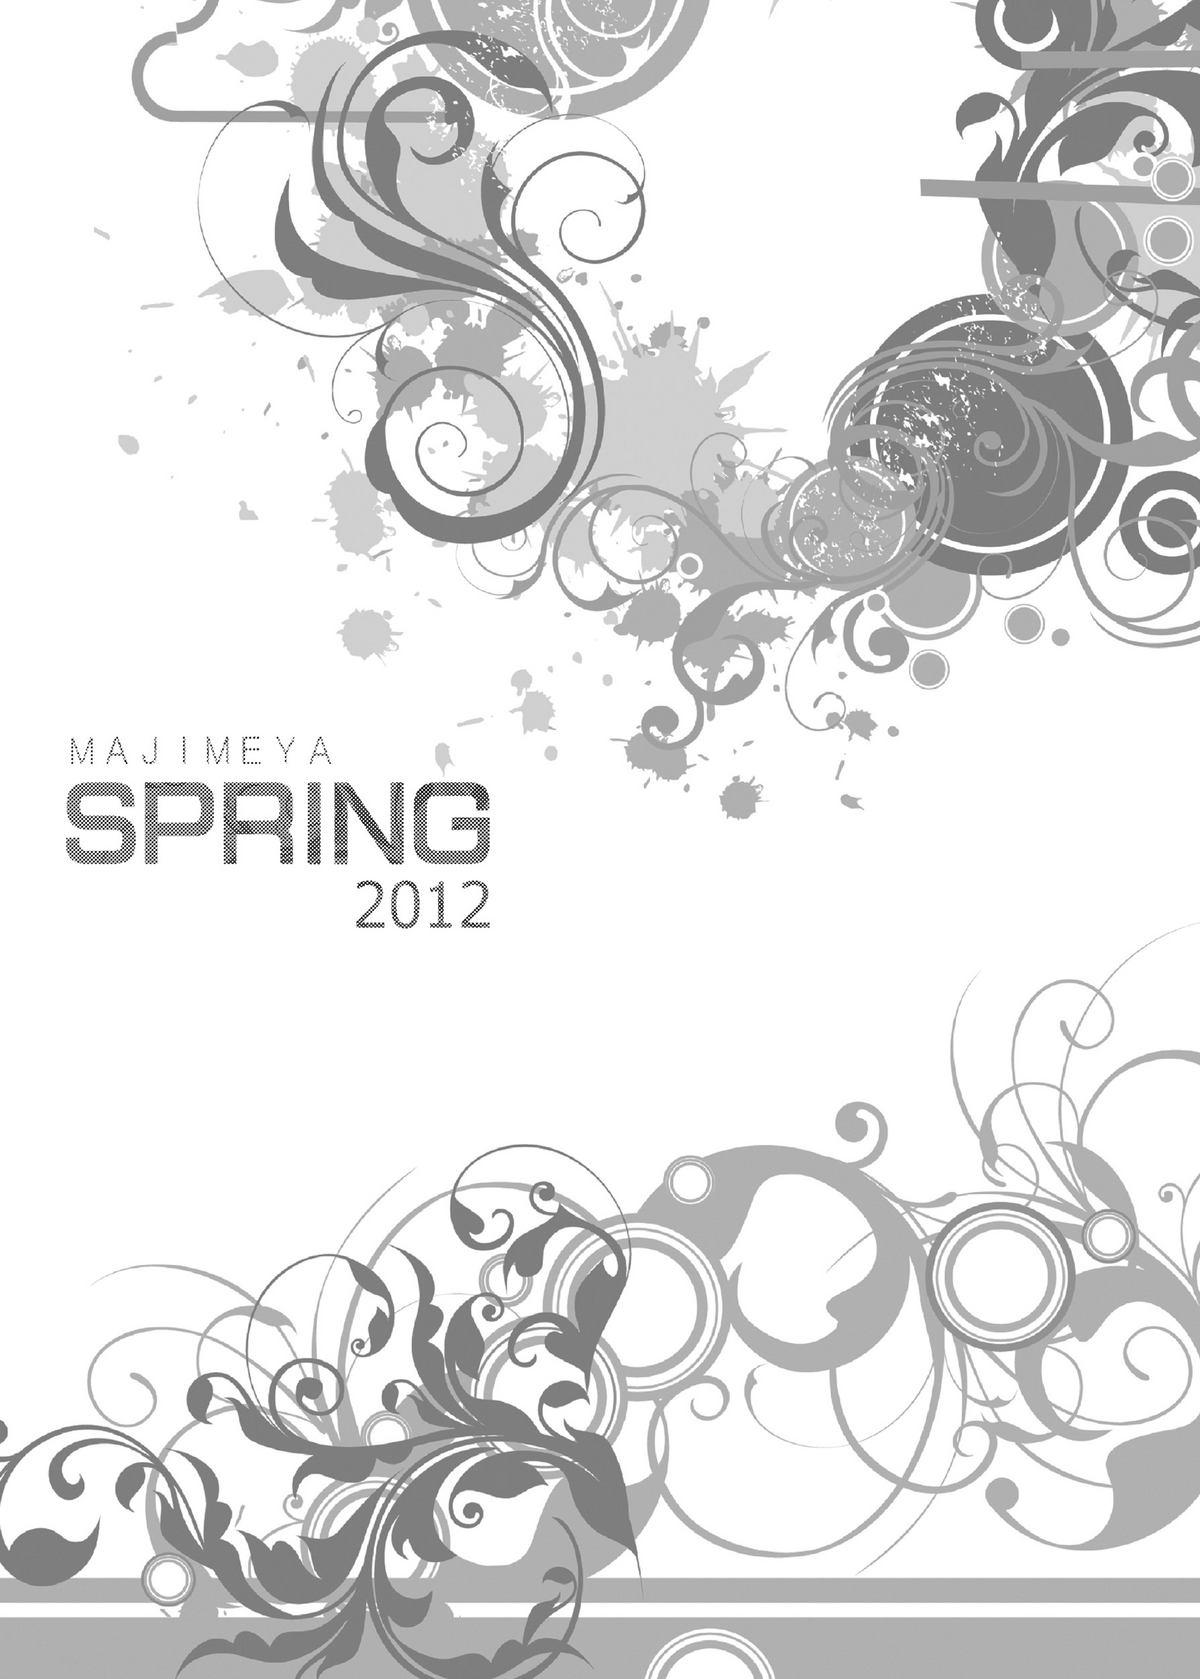 MAJIMEYA SPRING 2012 1